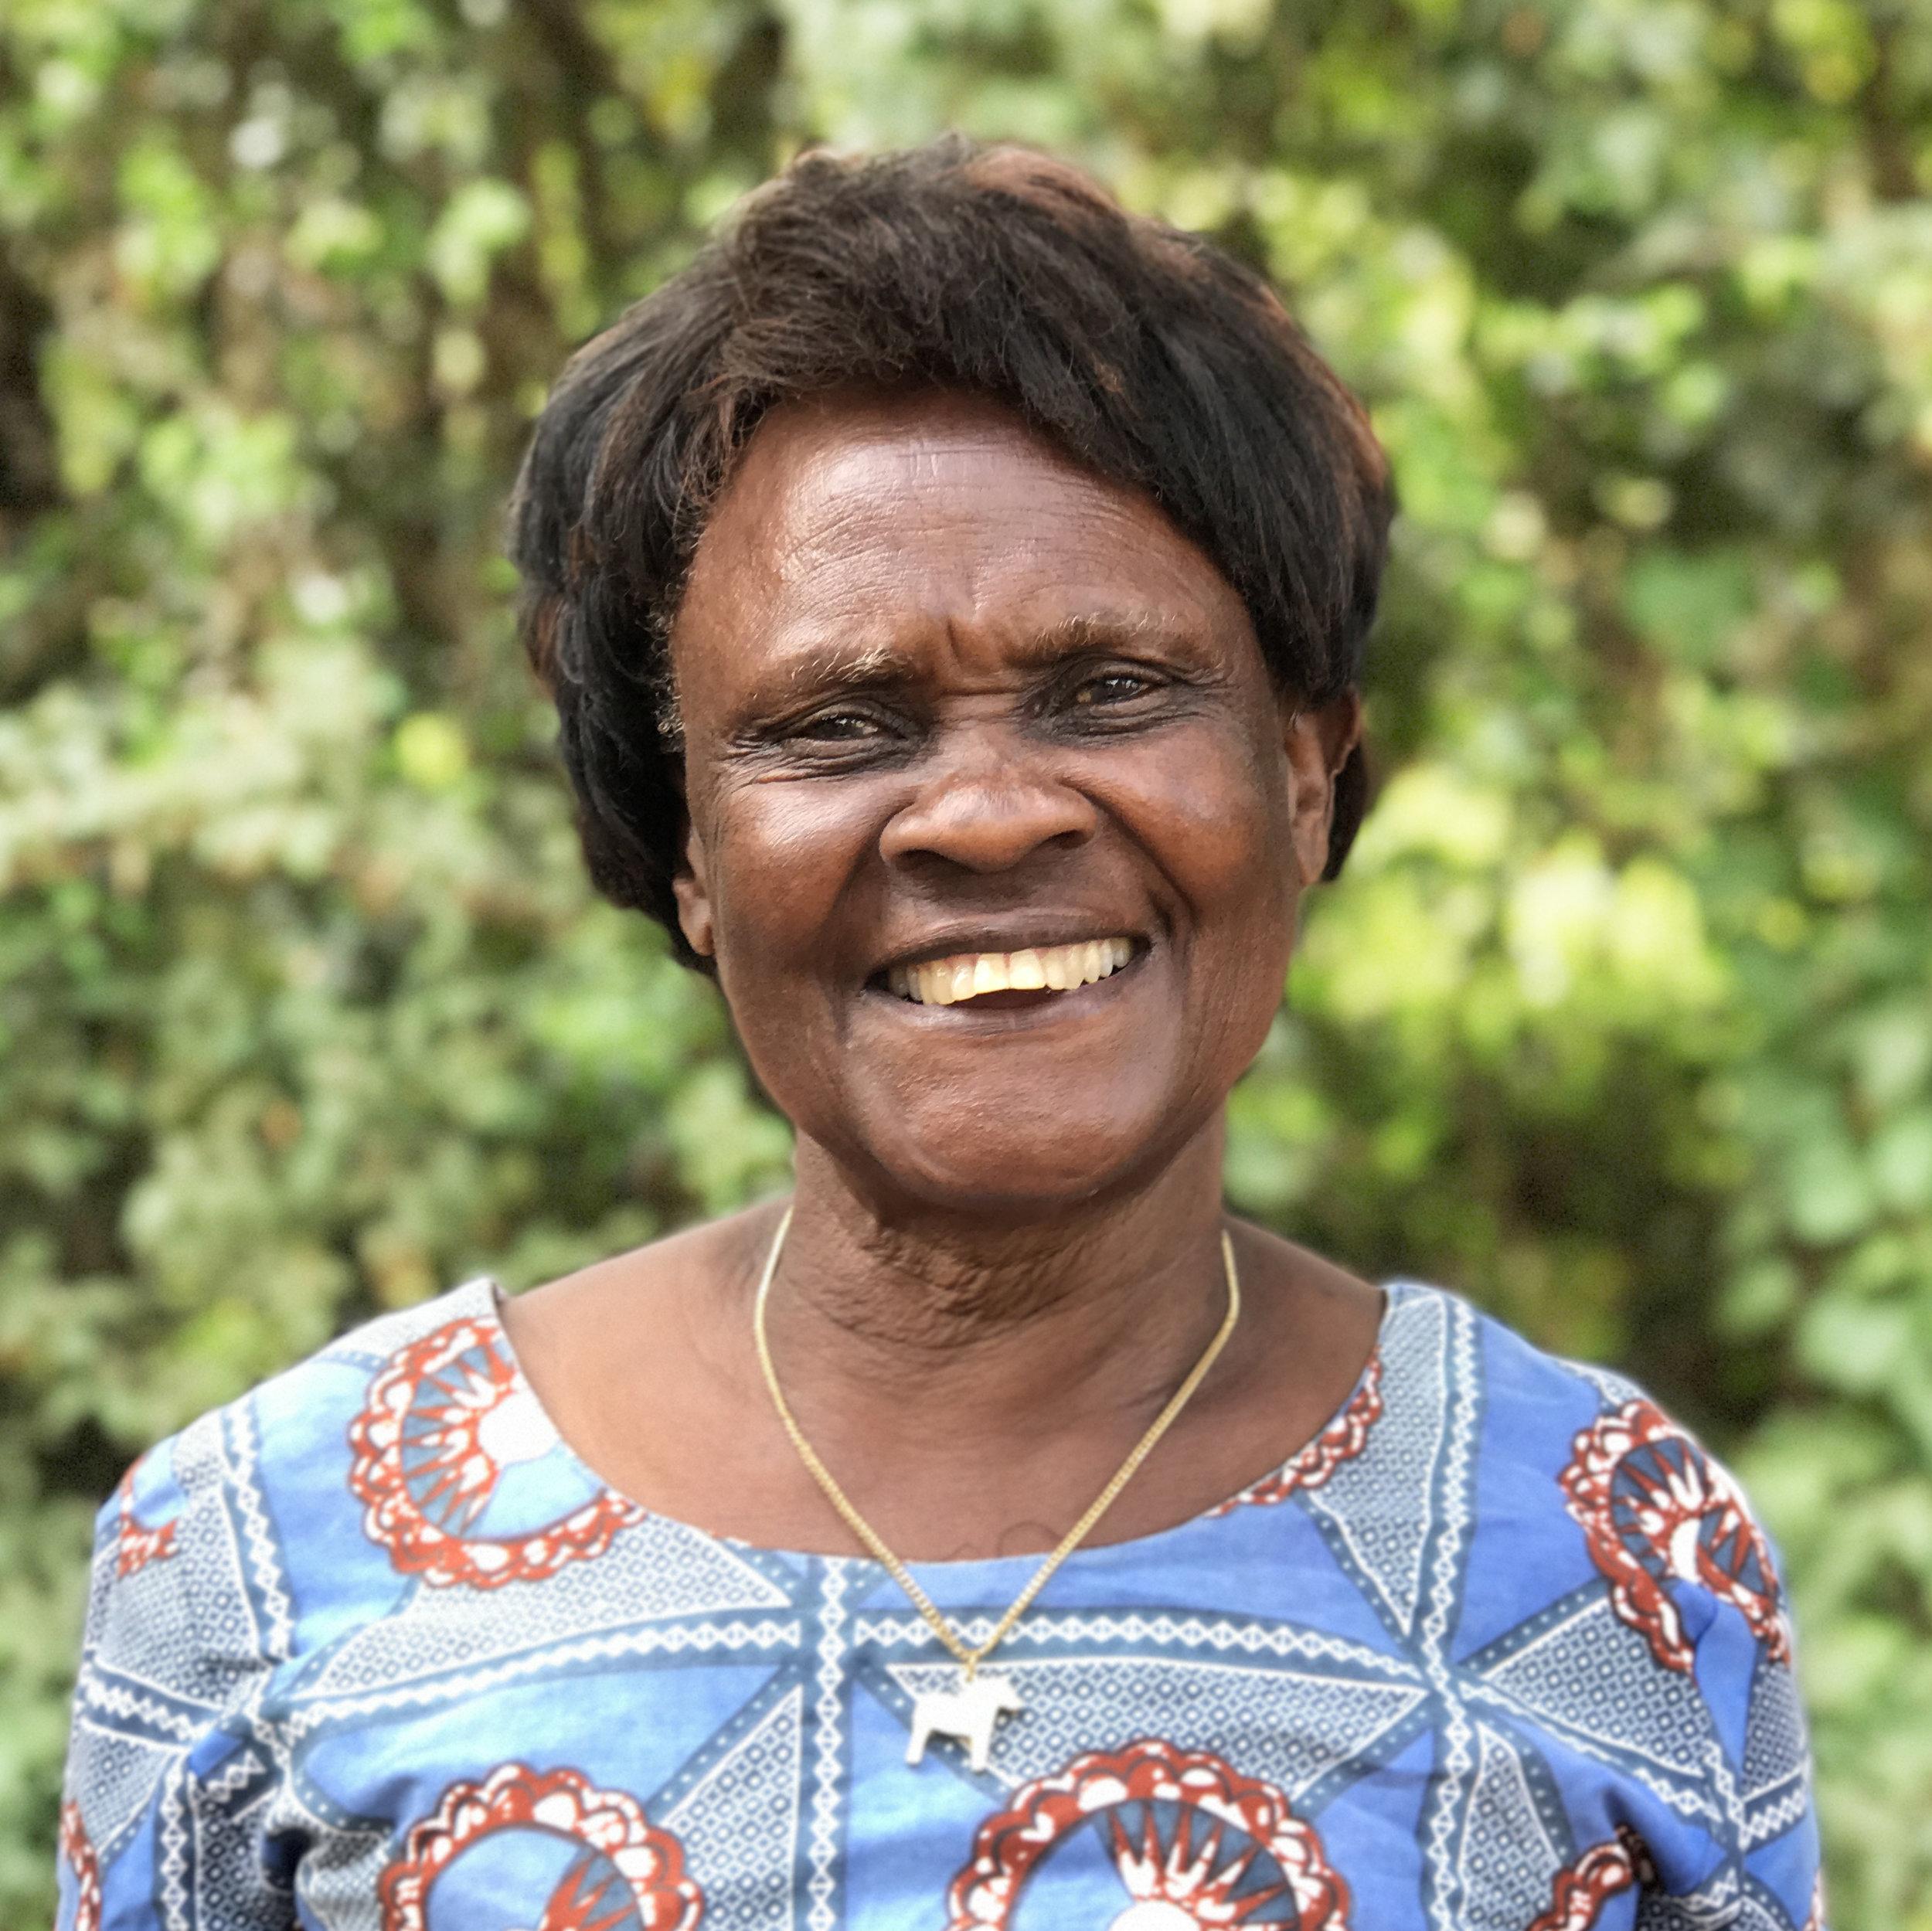 Mama Susan - Supervisor of Widows